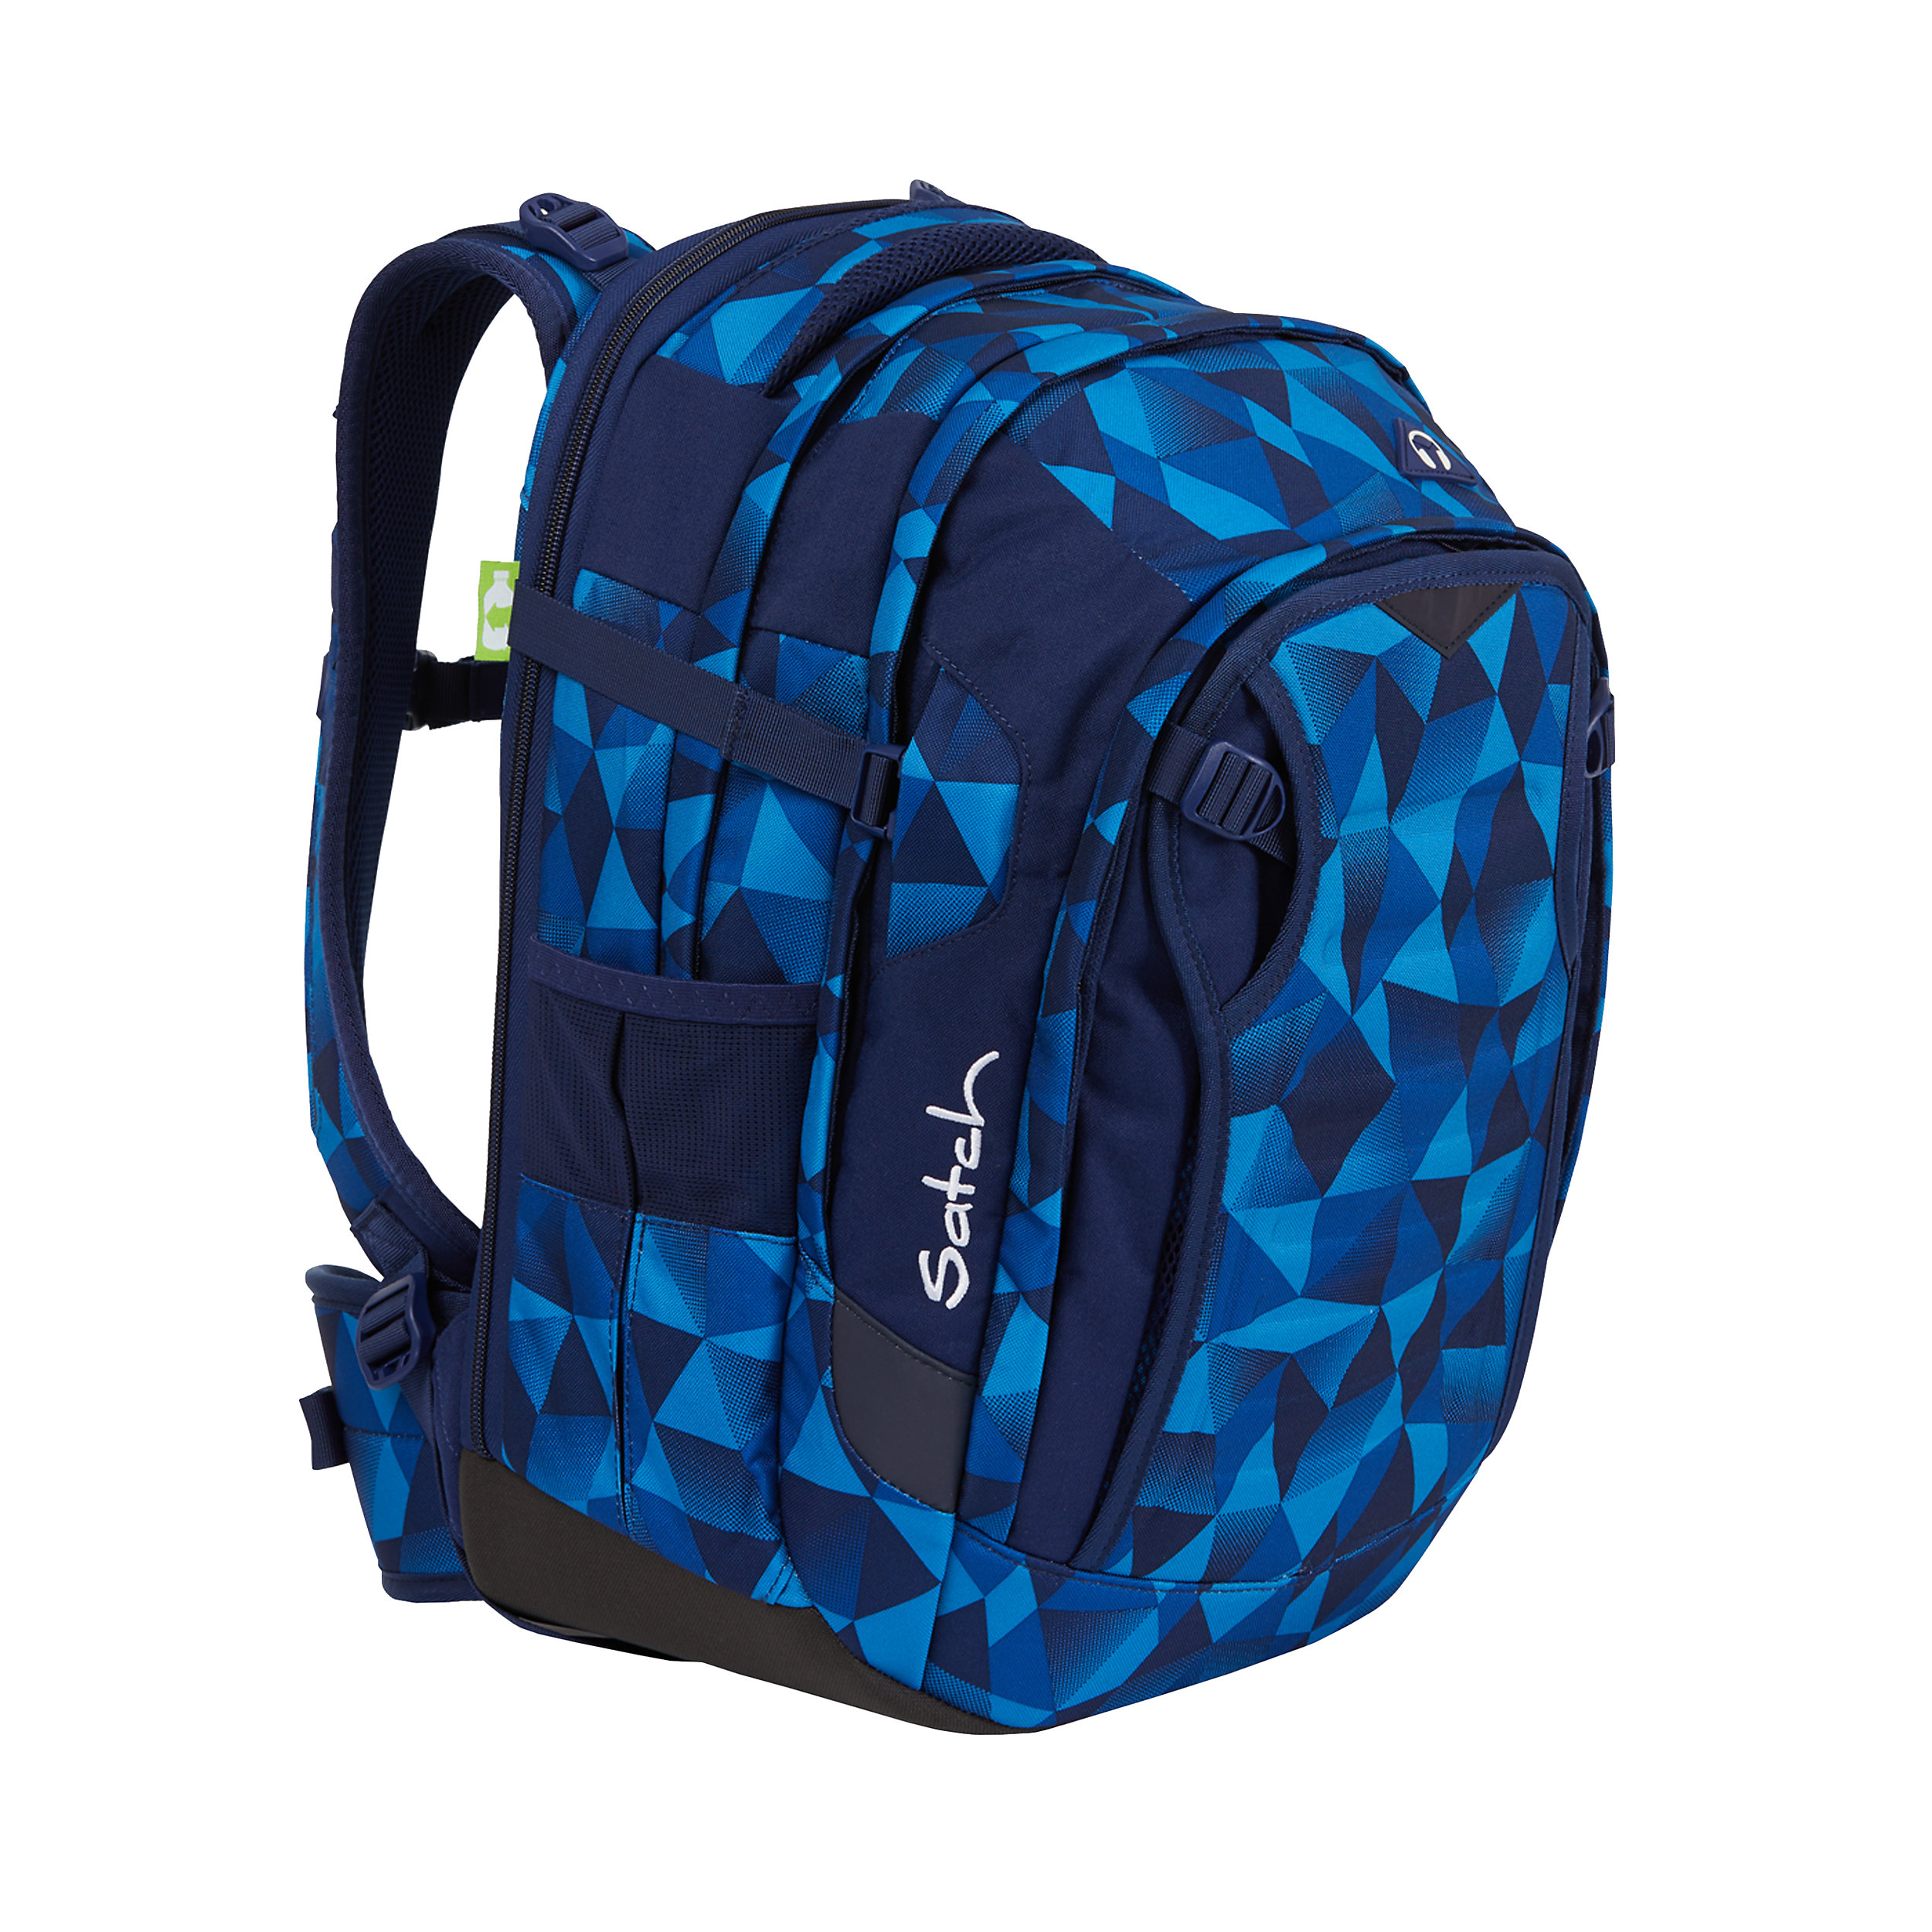 School Backpack 15,6 Inch Satch match 2.0 35 Liter